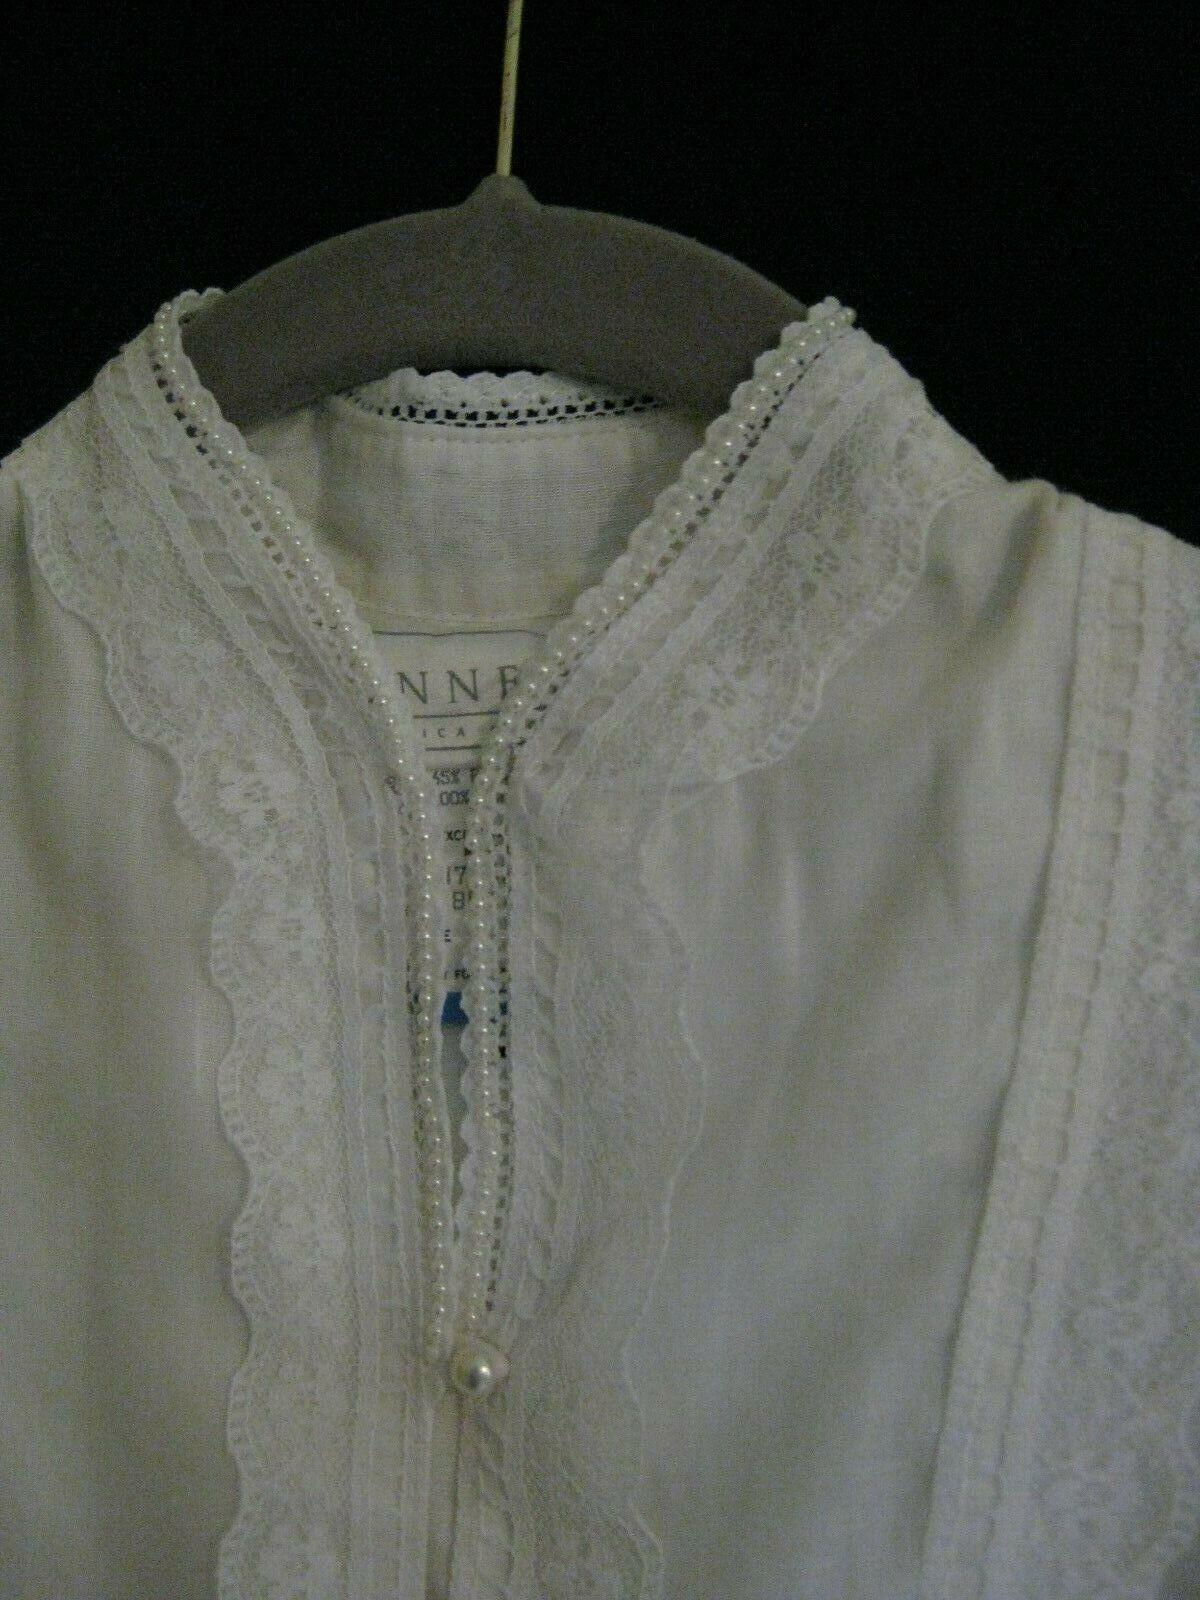 Gunne Sax White Dress Girls Size 12 Pre-Owned - image 3